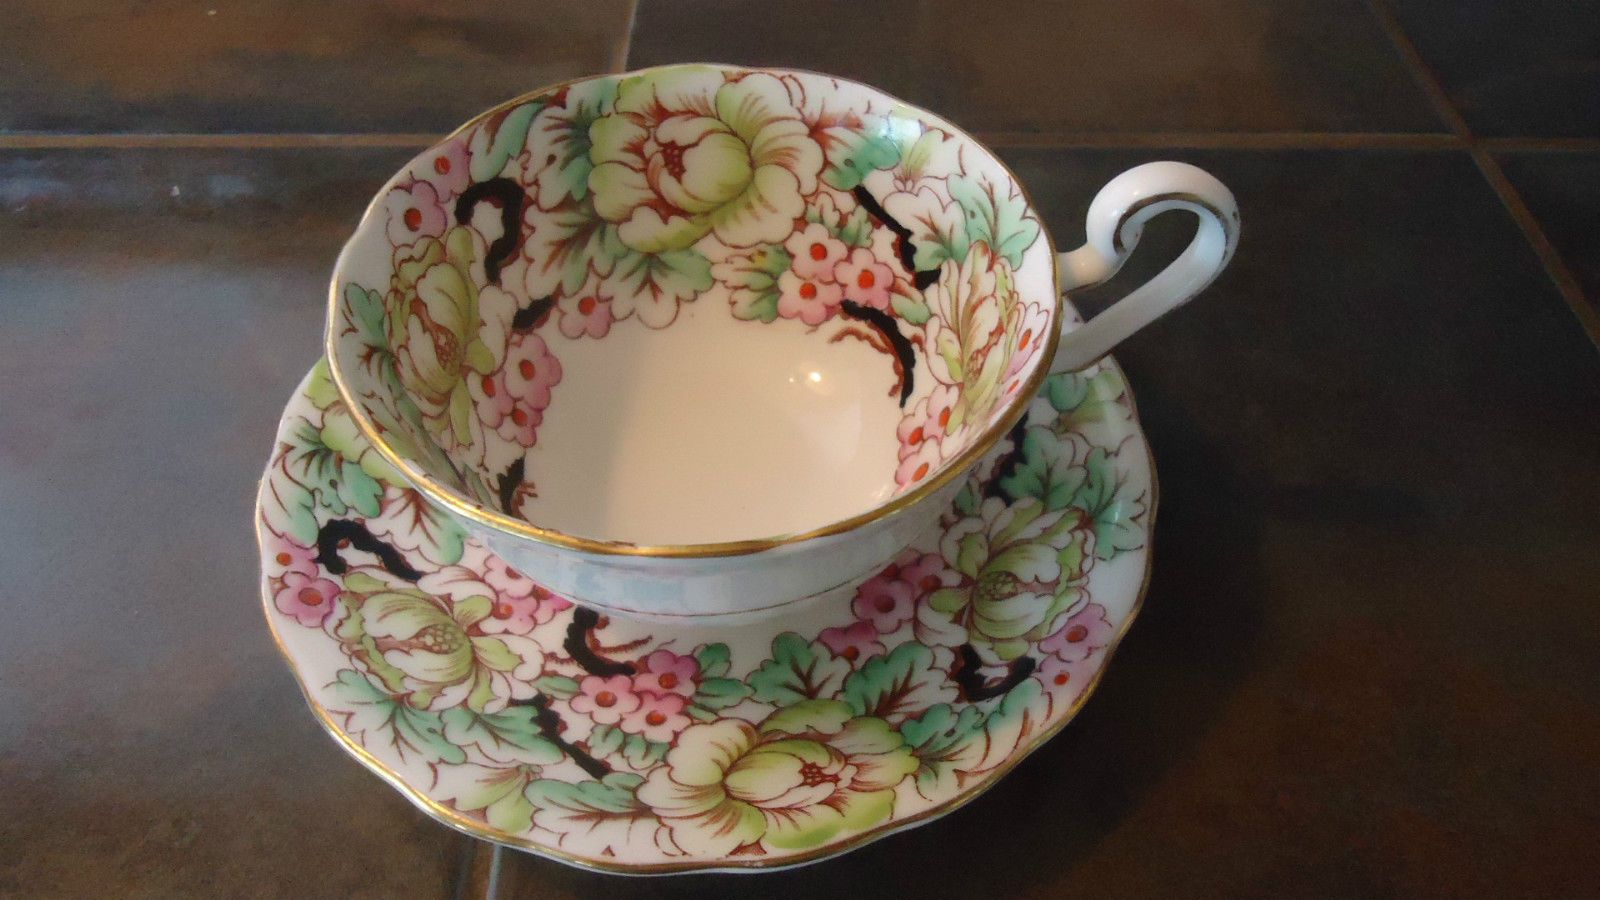 Vintage Victoria C&E Bone China Hand Painted Peony Teacup and Saucer, England